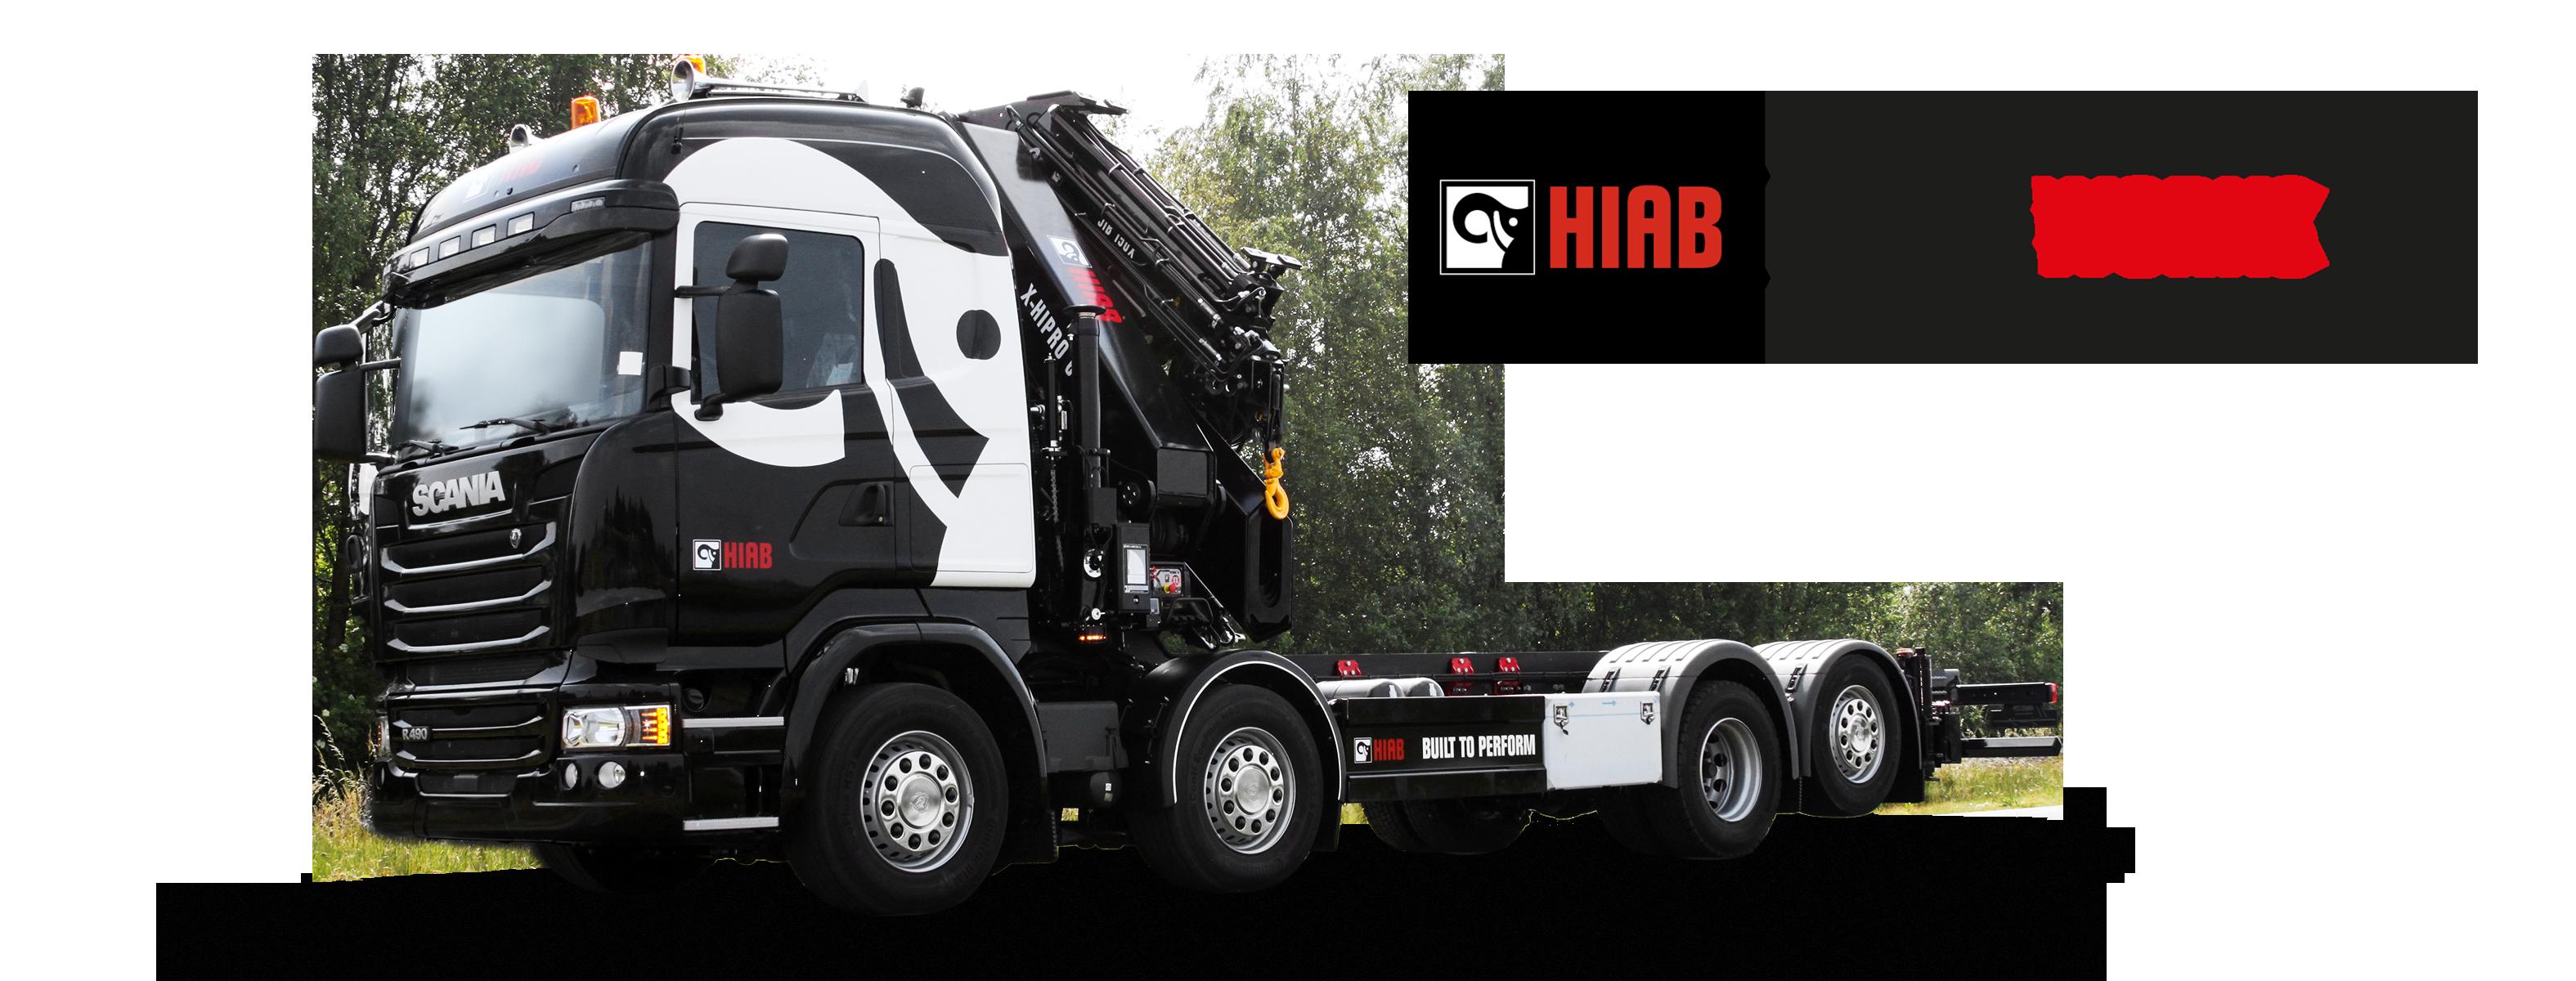 HIAB_truck_X-HiPro 638_Frameworks